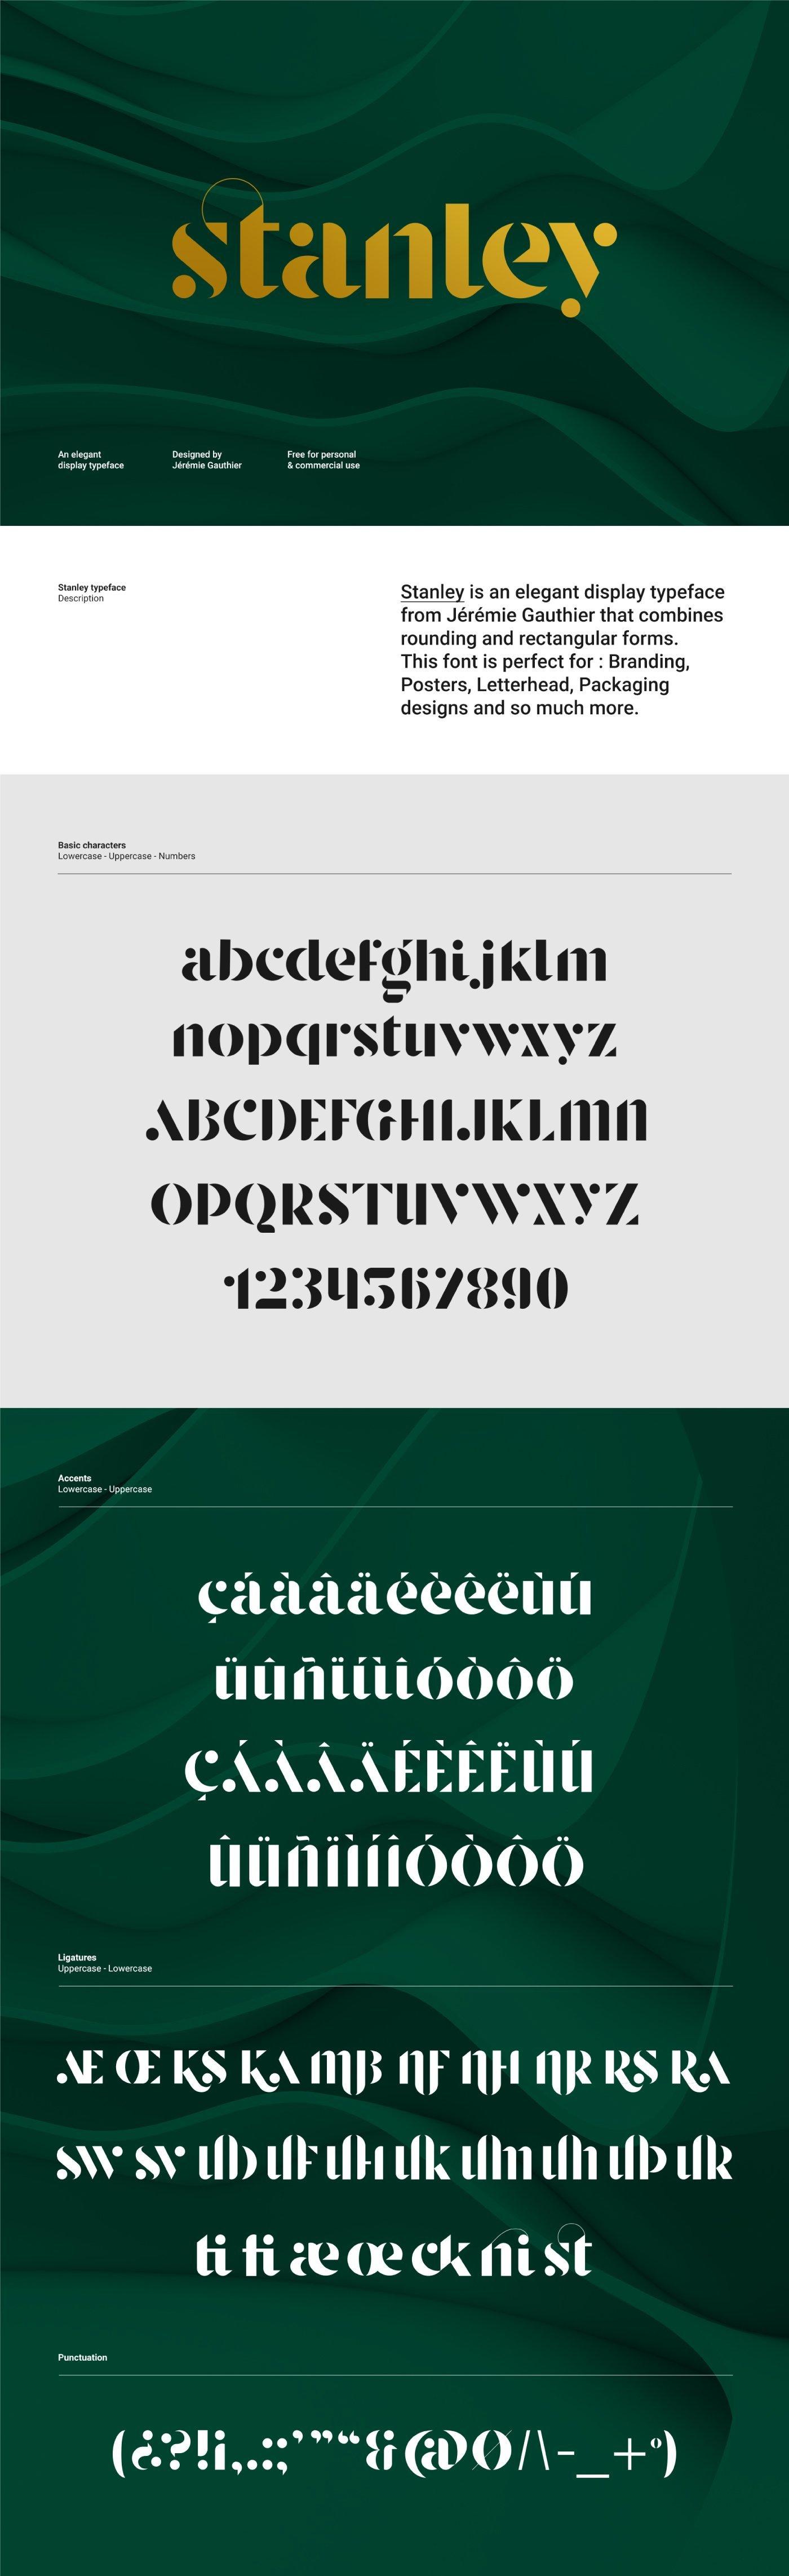 https://fontclarity.com/wp-content/uploads/2019/09/free-stanley-elegant-display-typeface-download-0.jpg Free Download